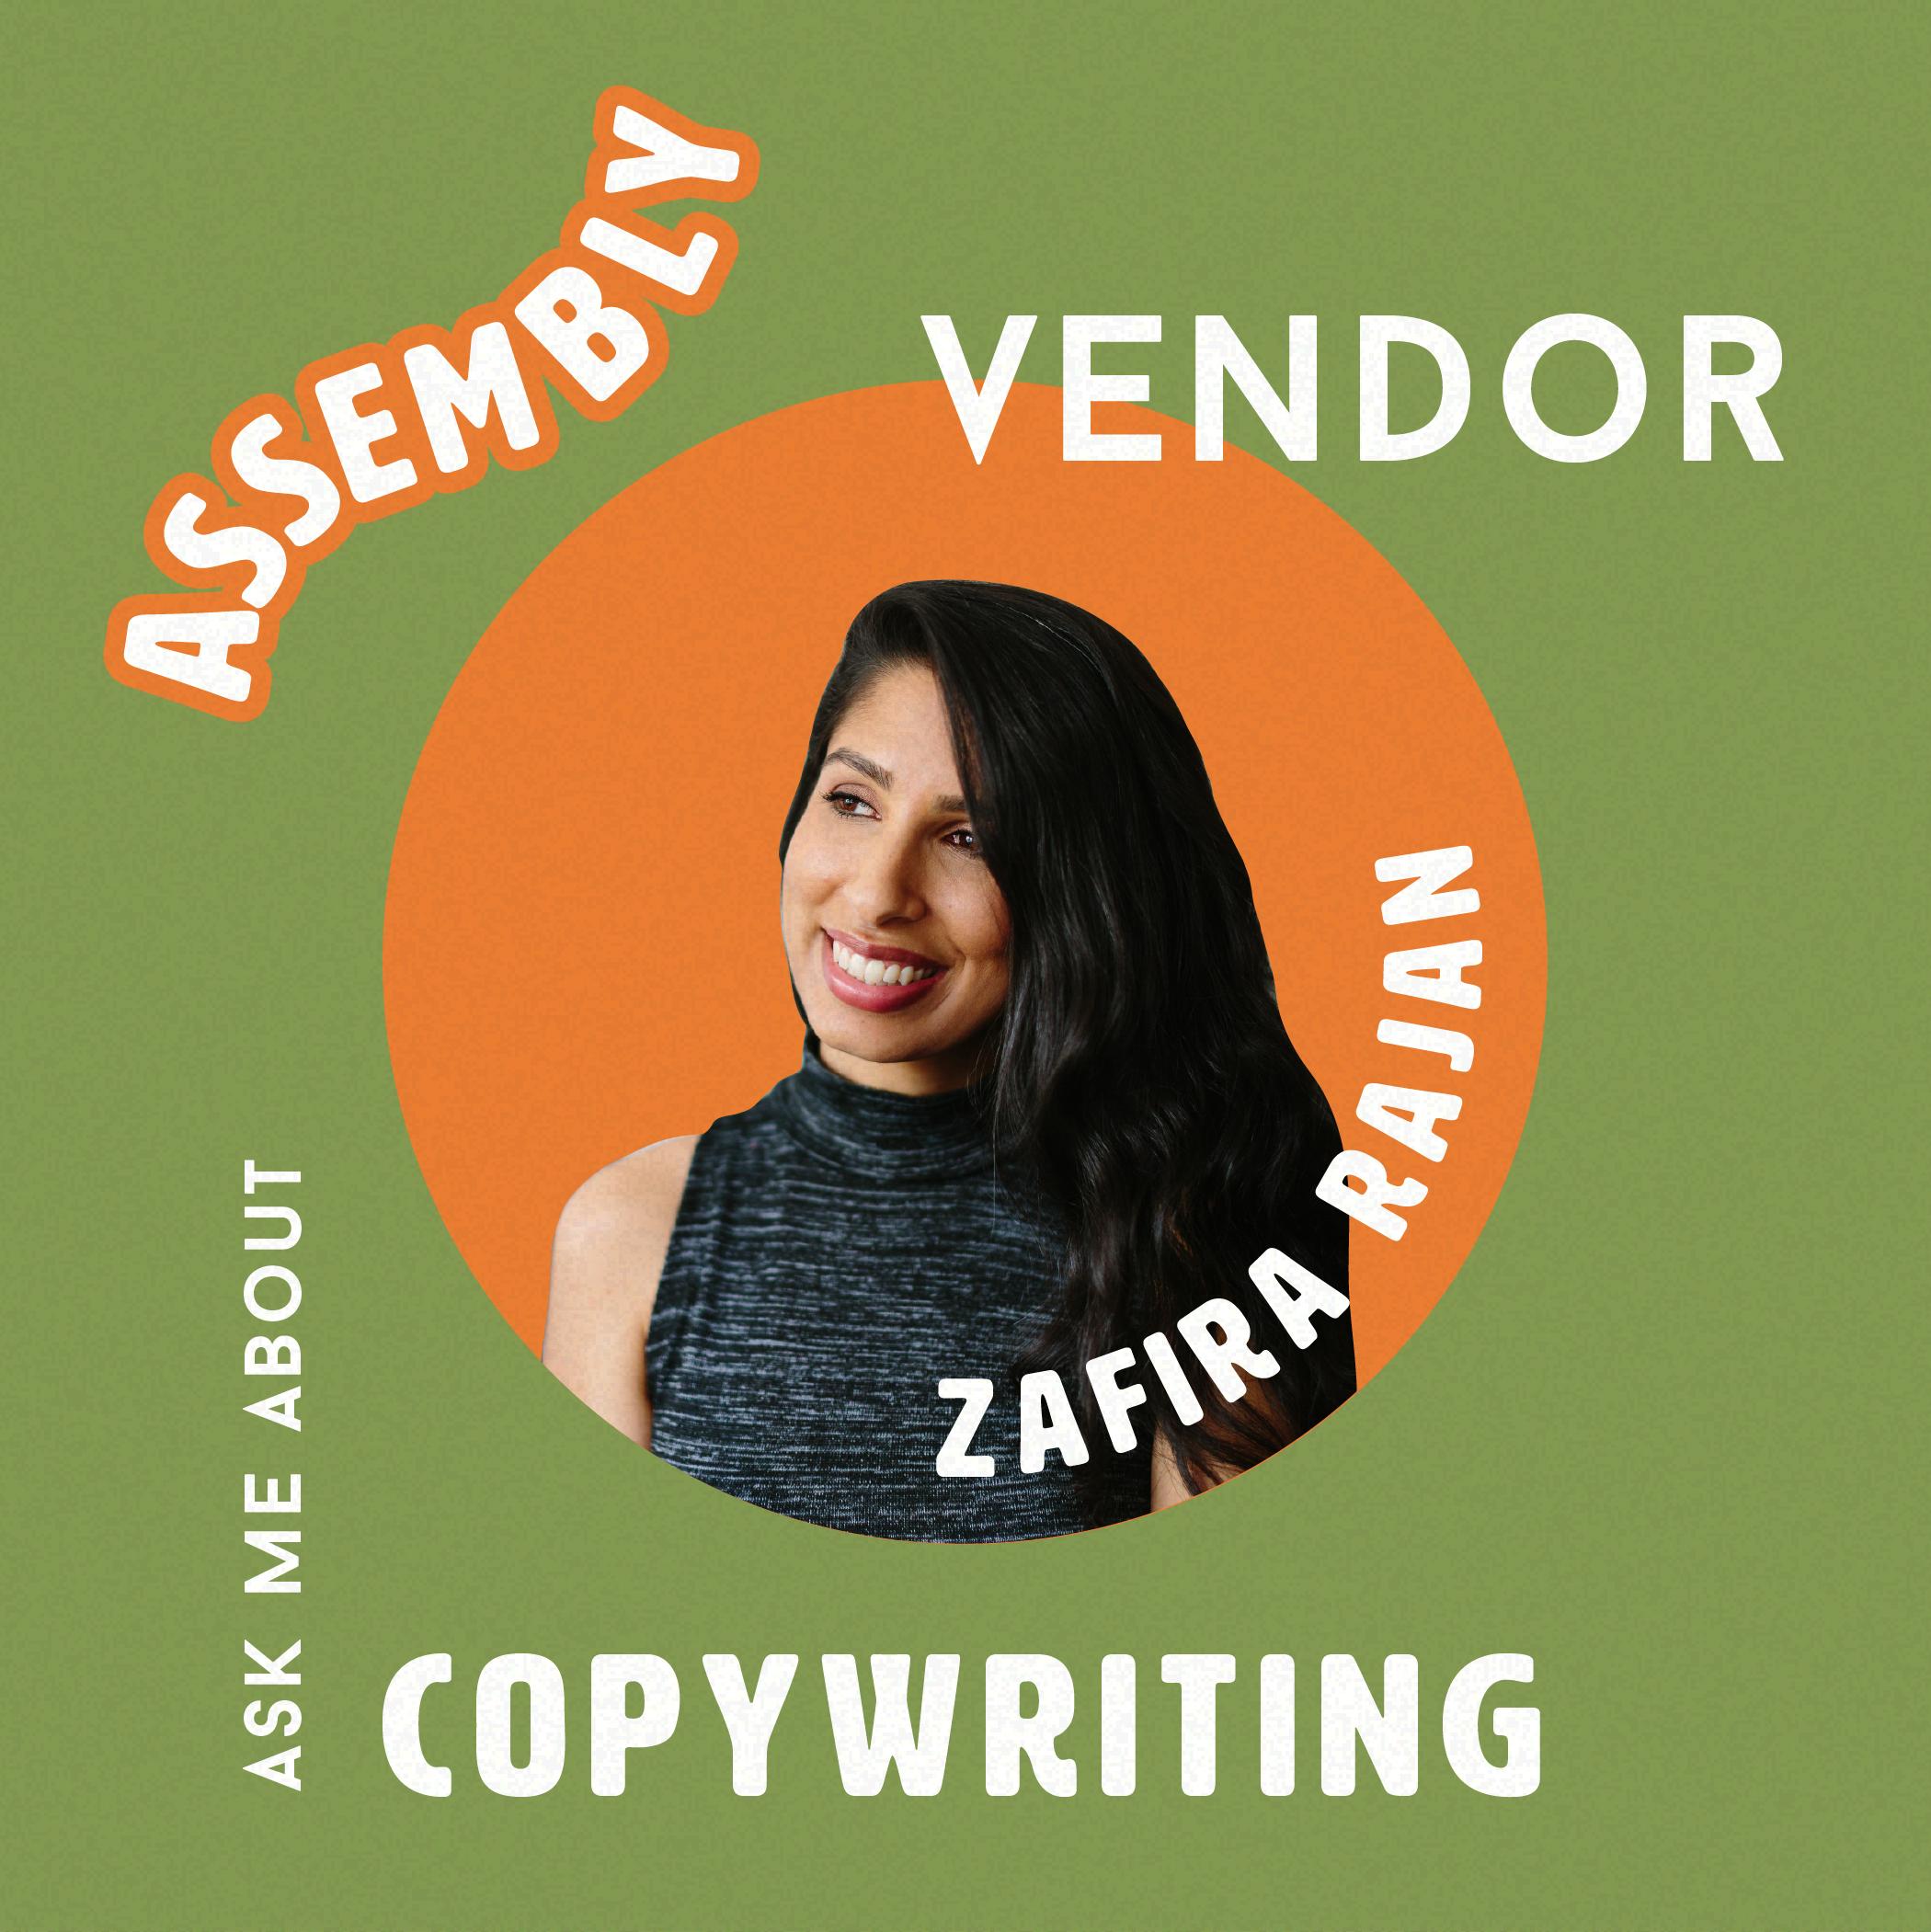 zafira+rajan+copywriter+assembly